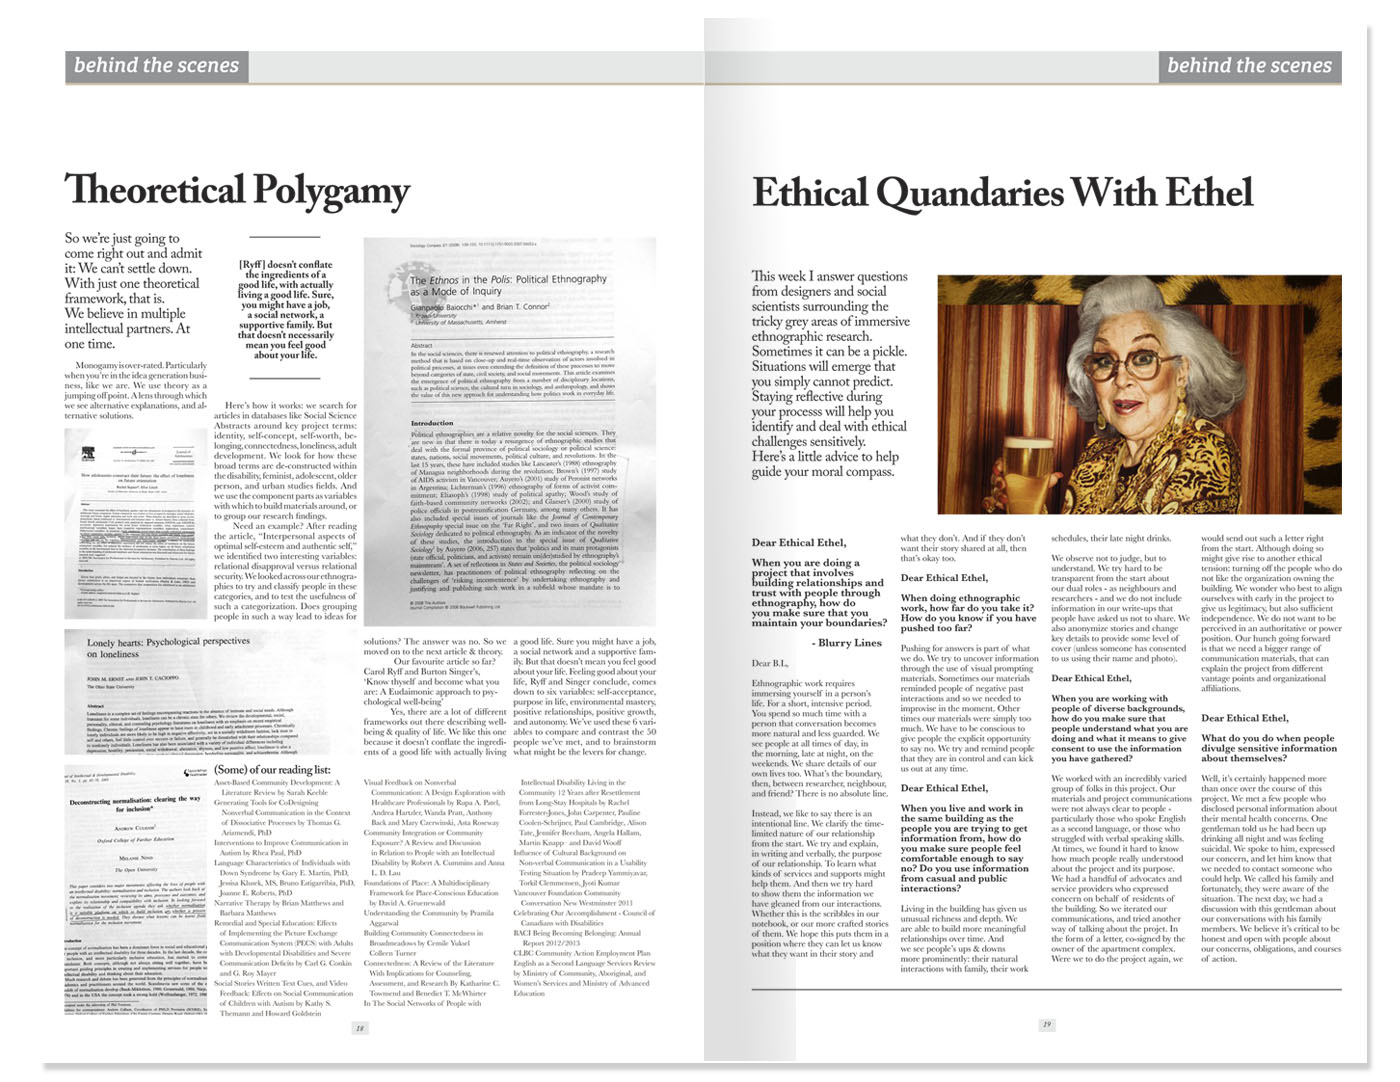 newspaperblog-images-theoryethics.jpg?mt